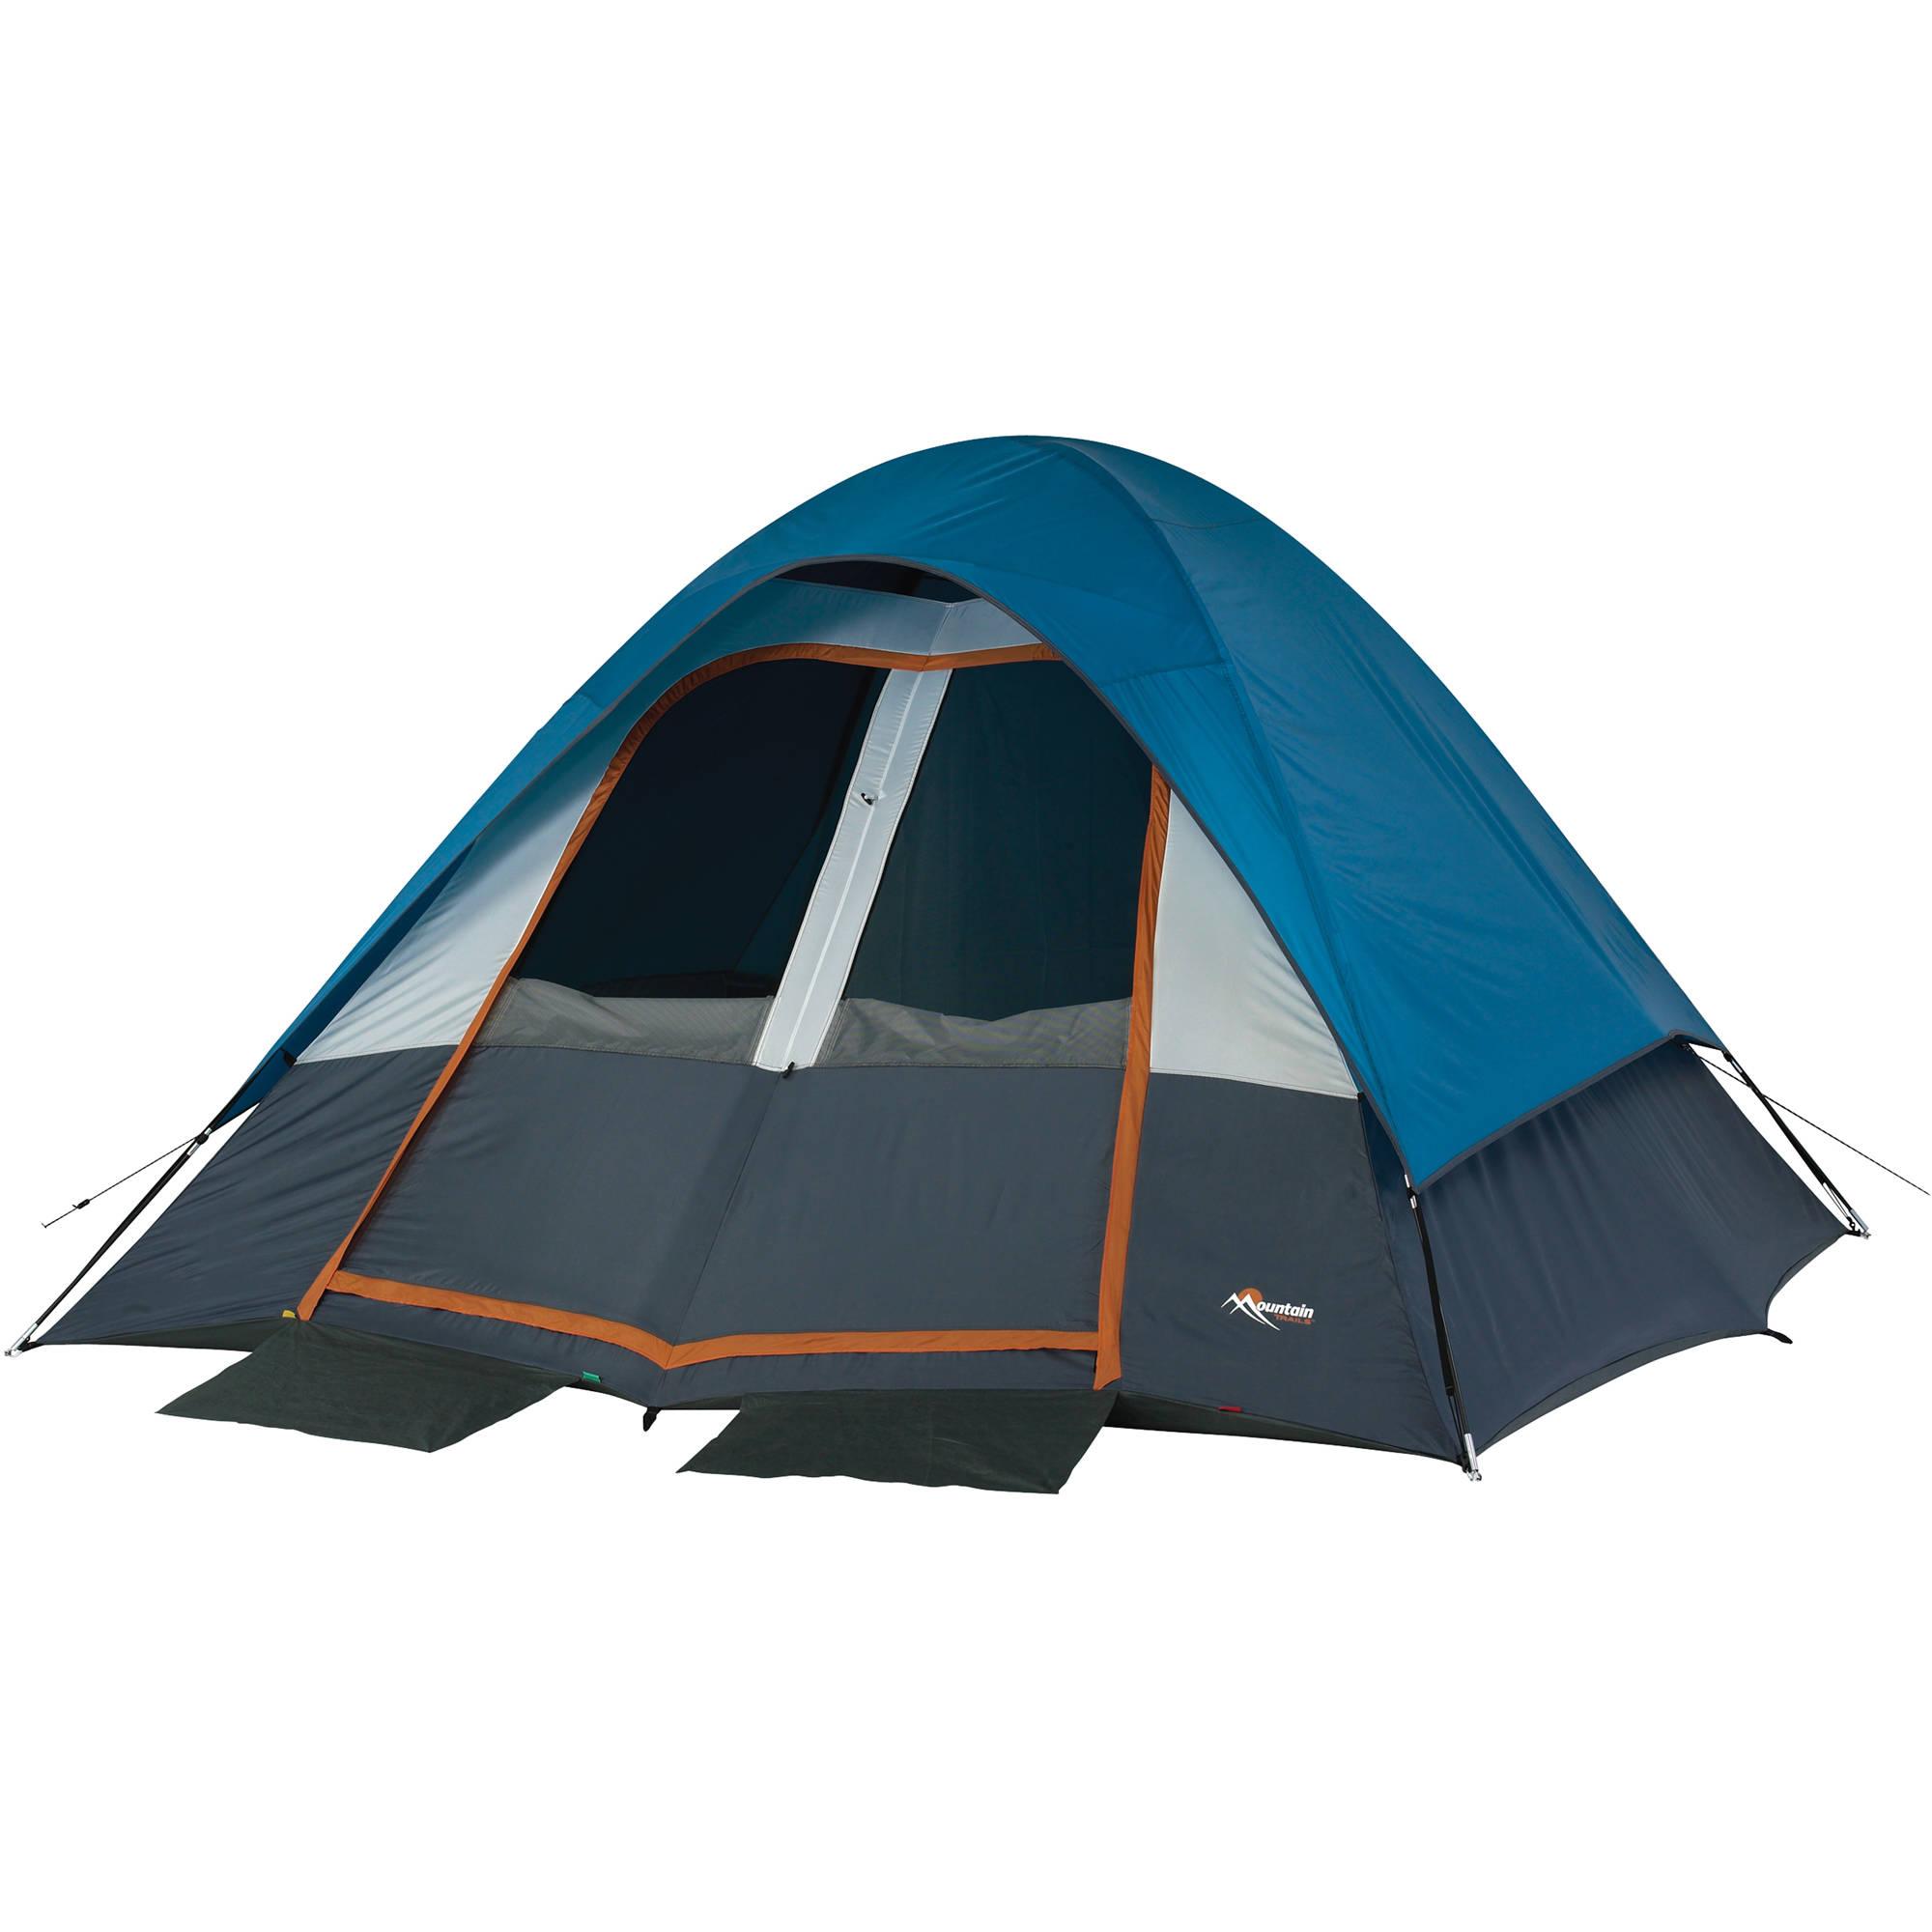 Mountain Trails Salmon River 6-Person Dome Tent  sc 1 st  Bu0026H & Mountain Trails Salmon River 6-Person Dome Tent 36445 Bu0026H Photo